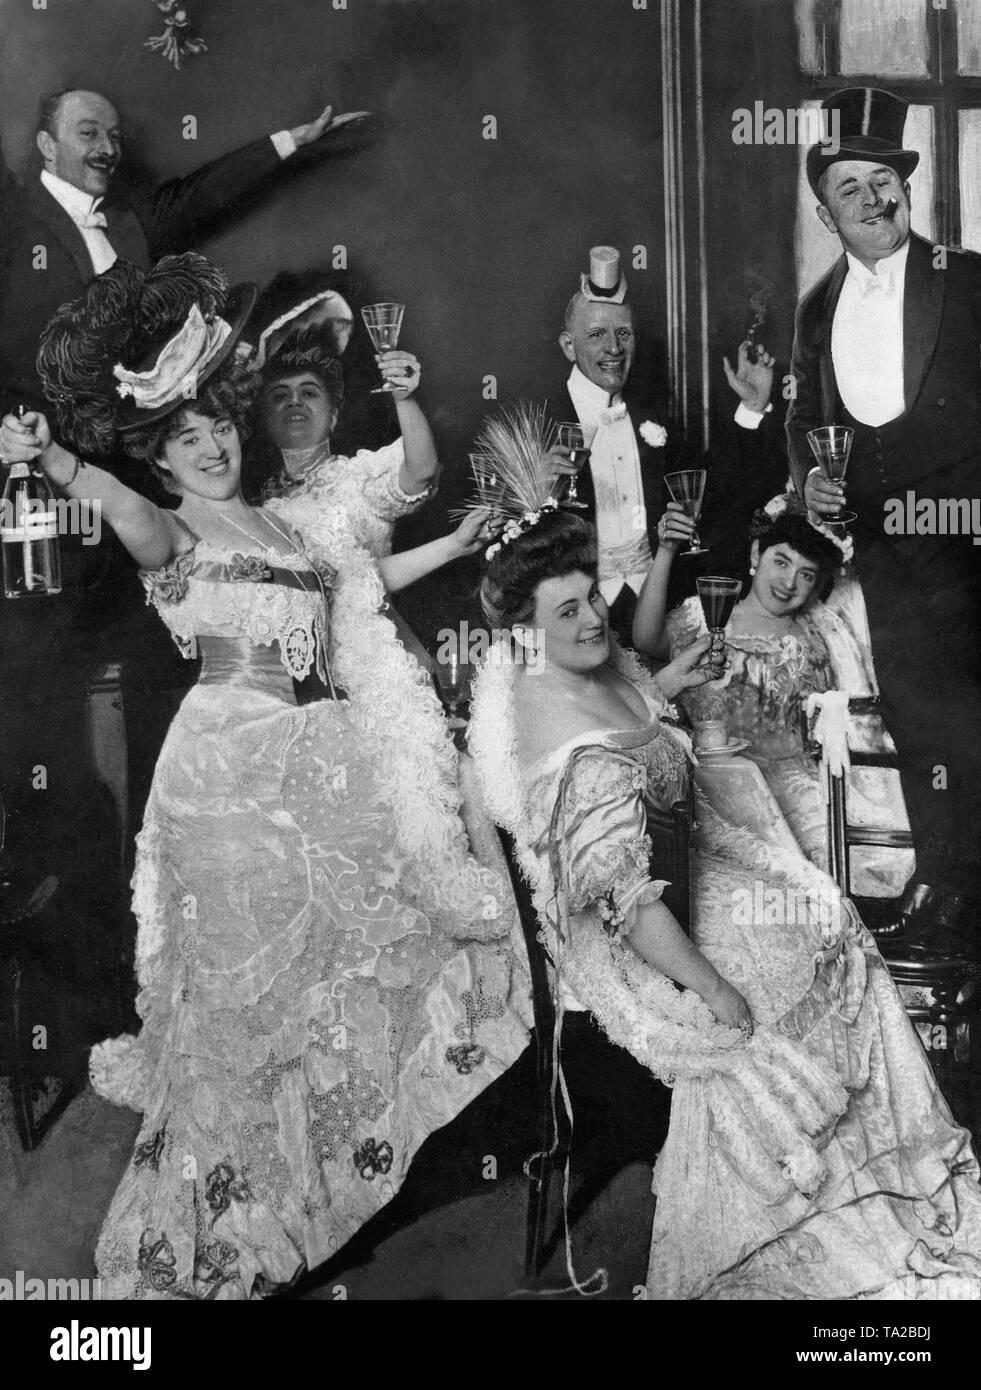 Artists (left to right): Hans Junkermann, Else von Ruettersheim, Ms Junkermann, Phila Wolff, Josef Giampietro, Fritzi Massary, Guido Thielscher celebrate New Year's Eve. - Stock Image